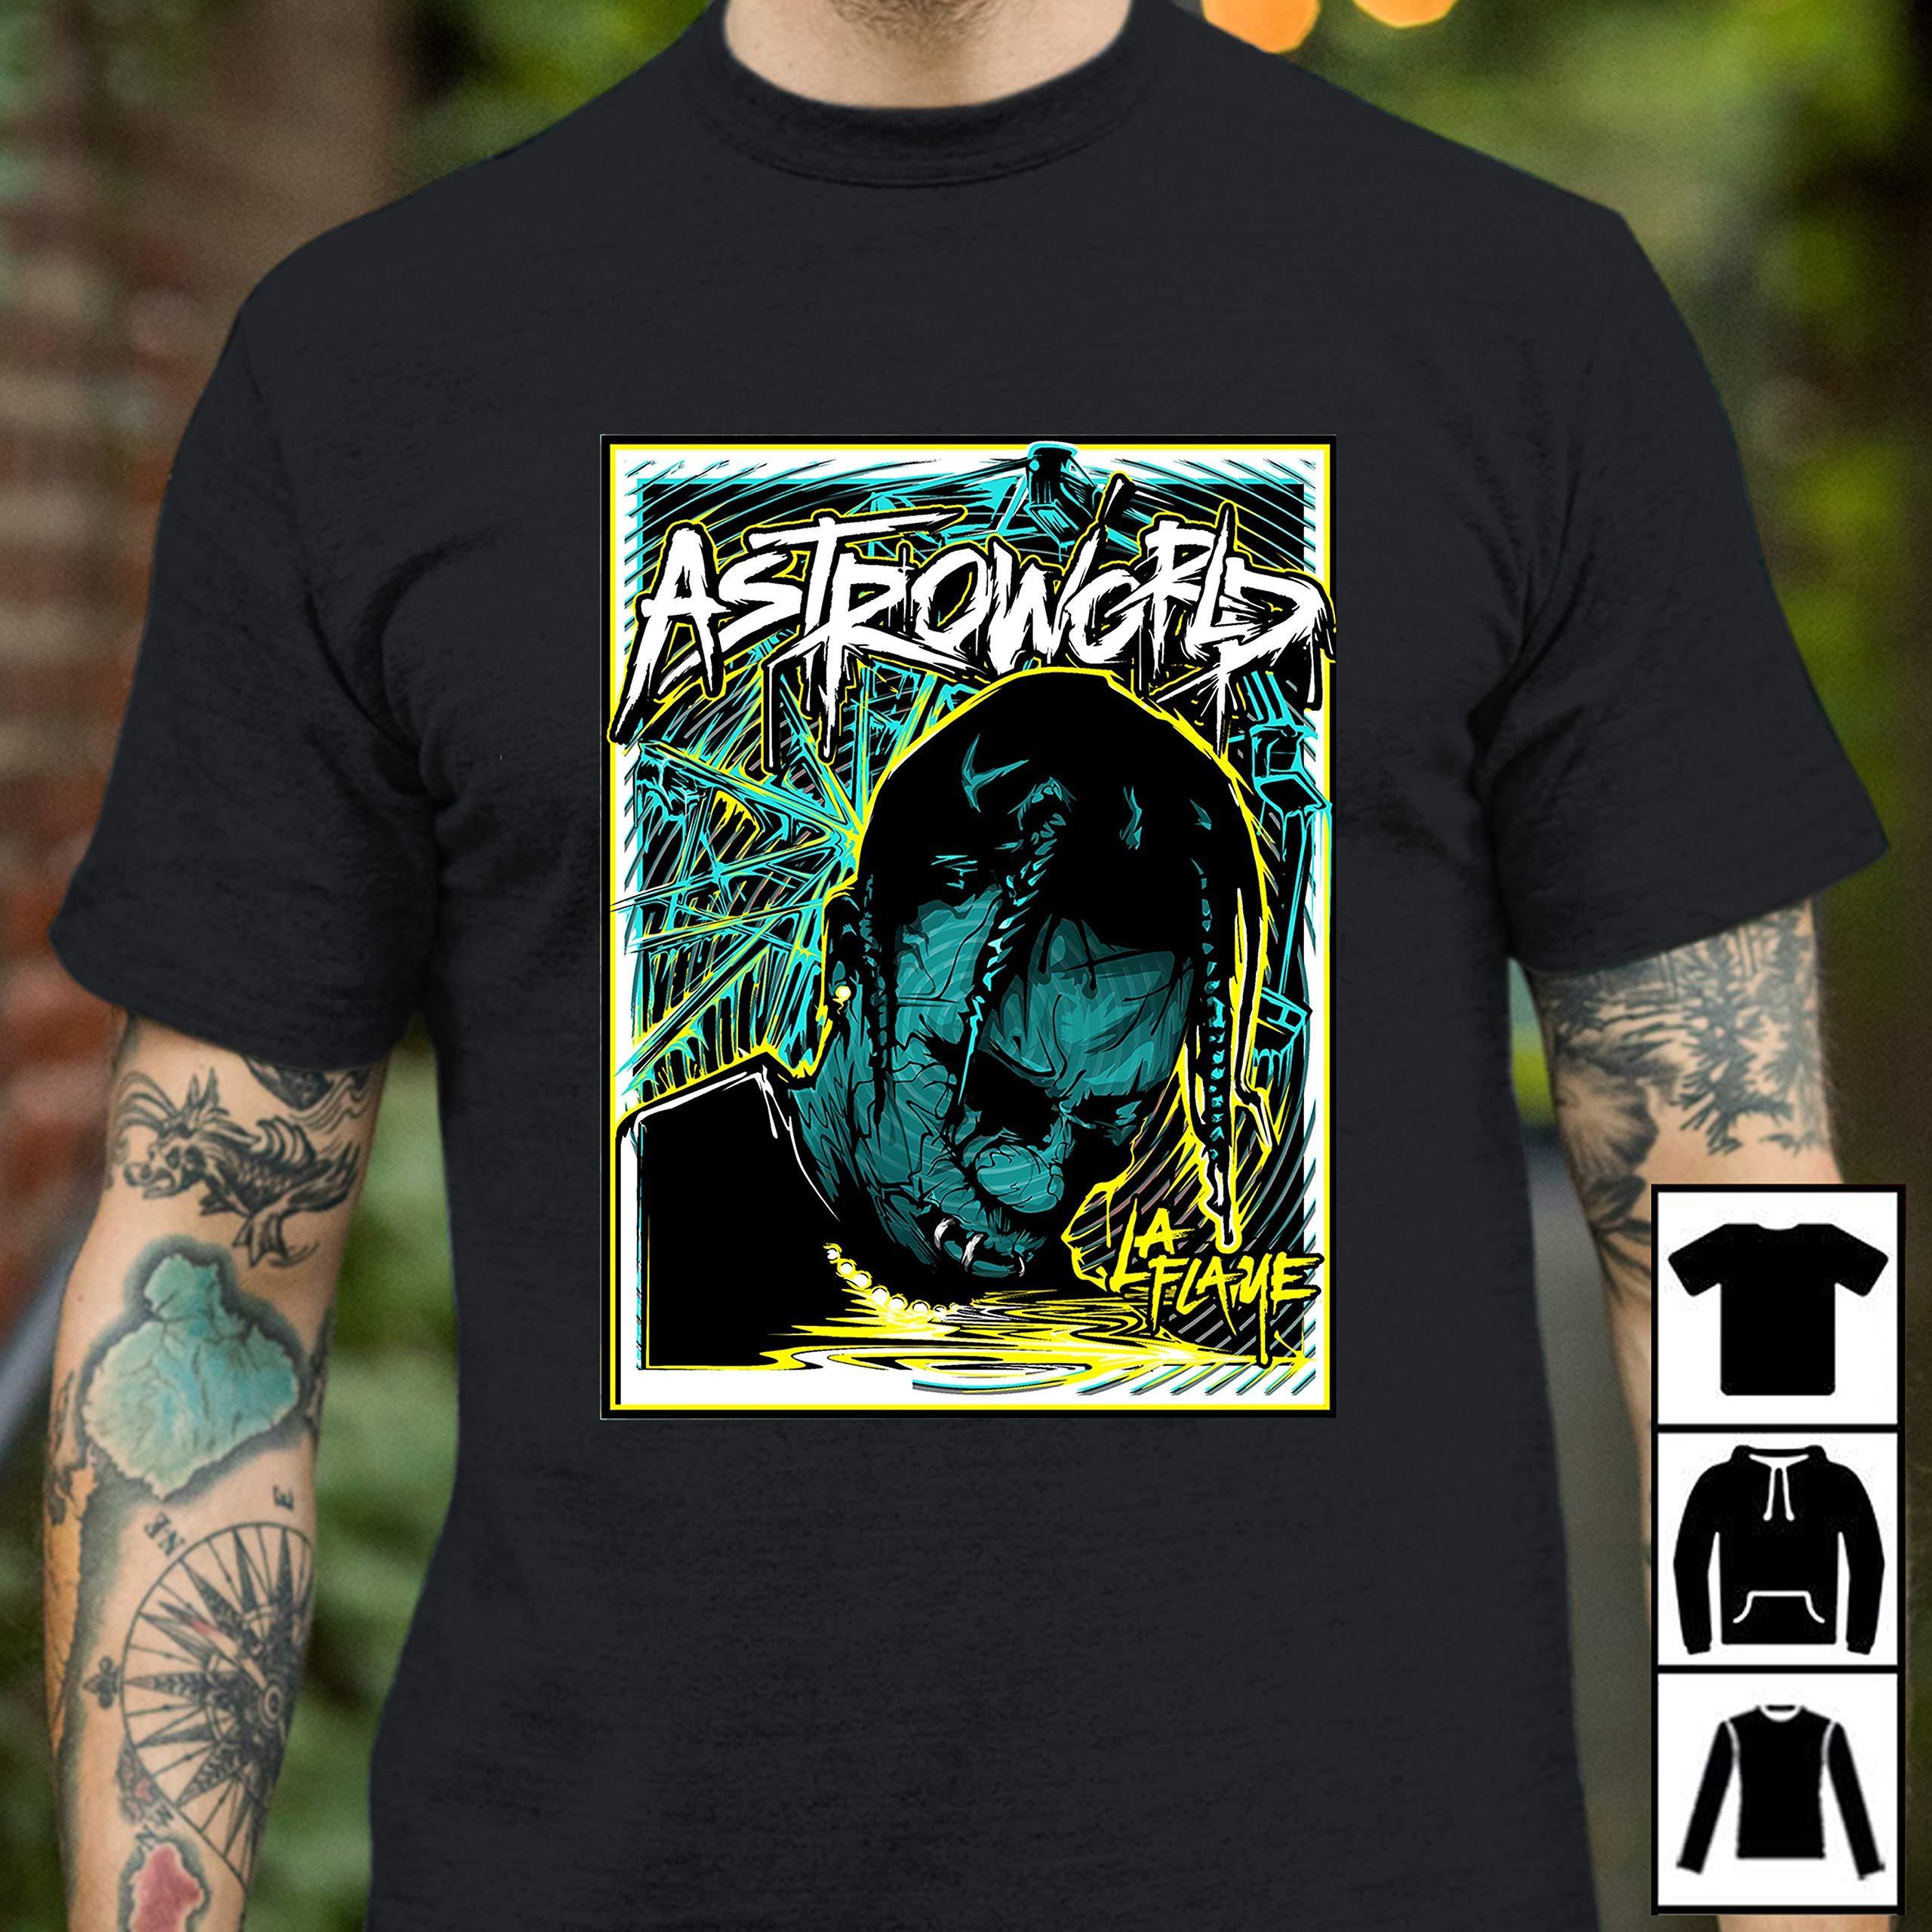 Travis Scott Long Shirts